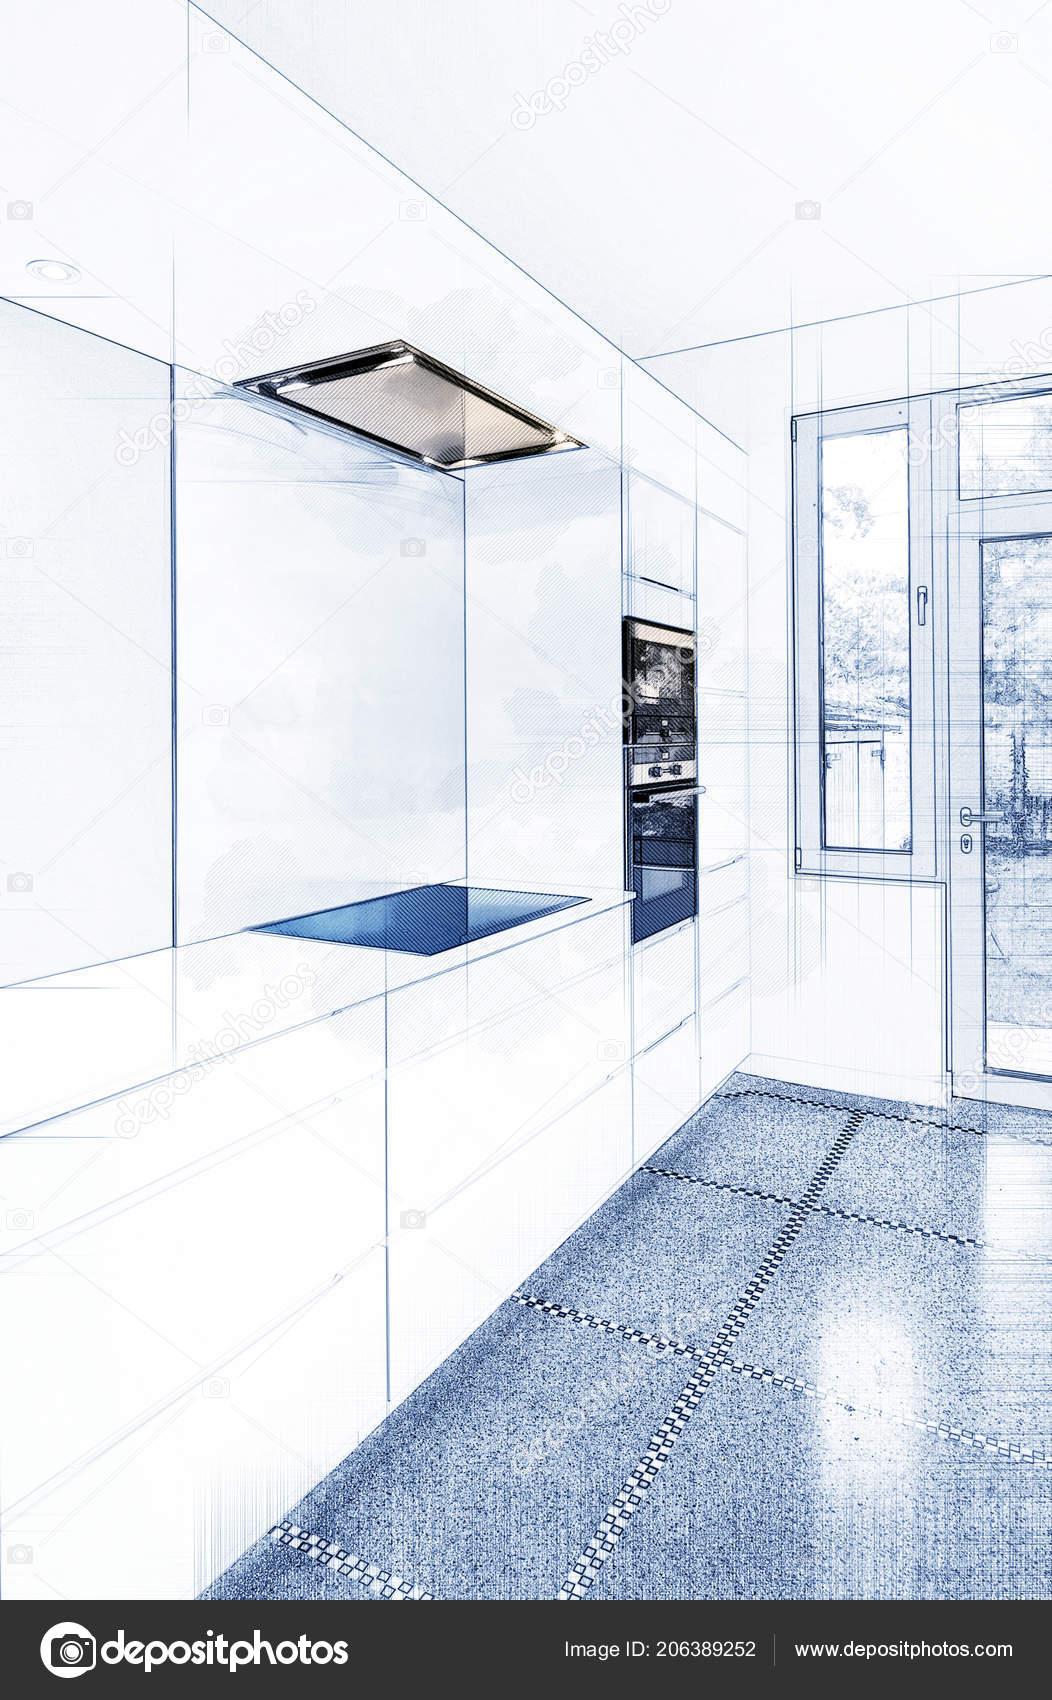 Sketch stylish modern kitchen interior perspective stock photo